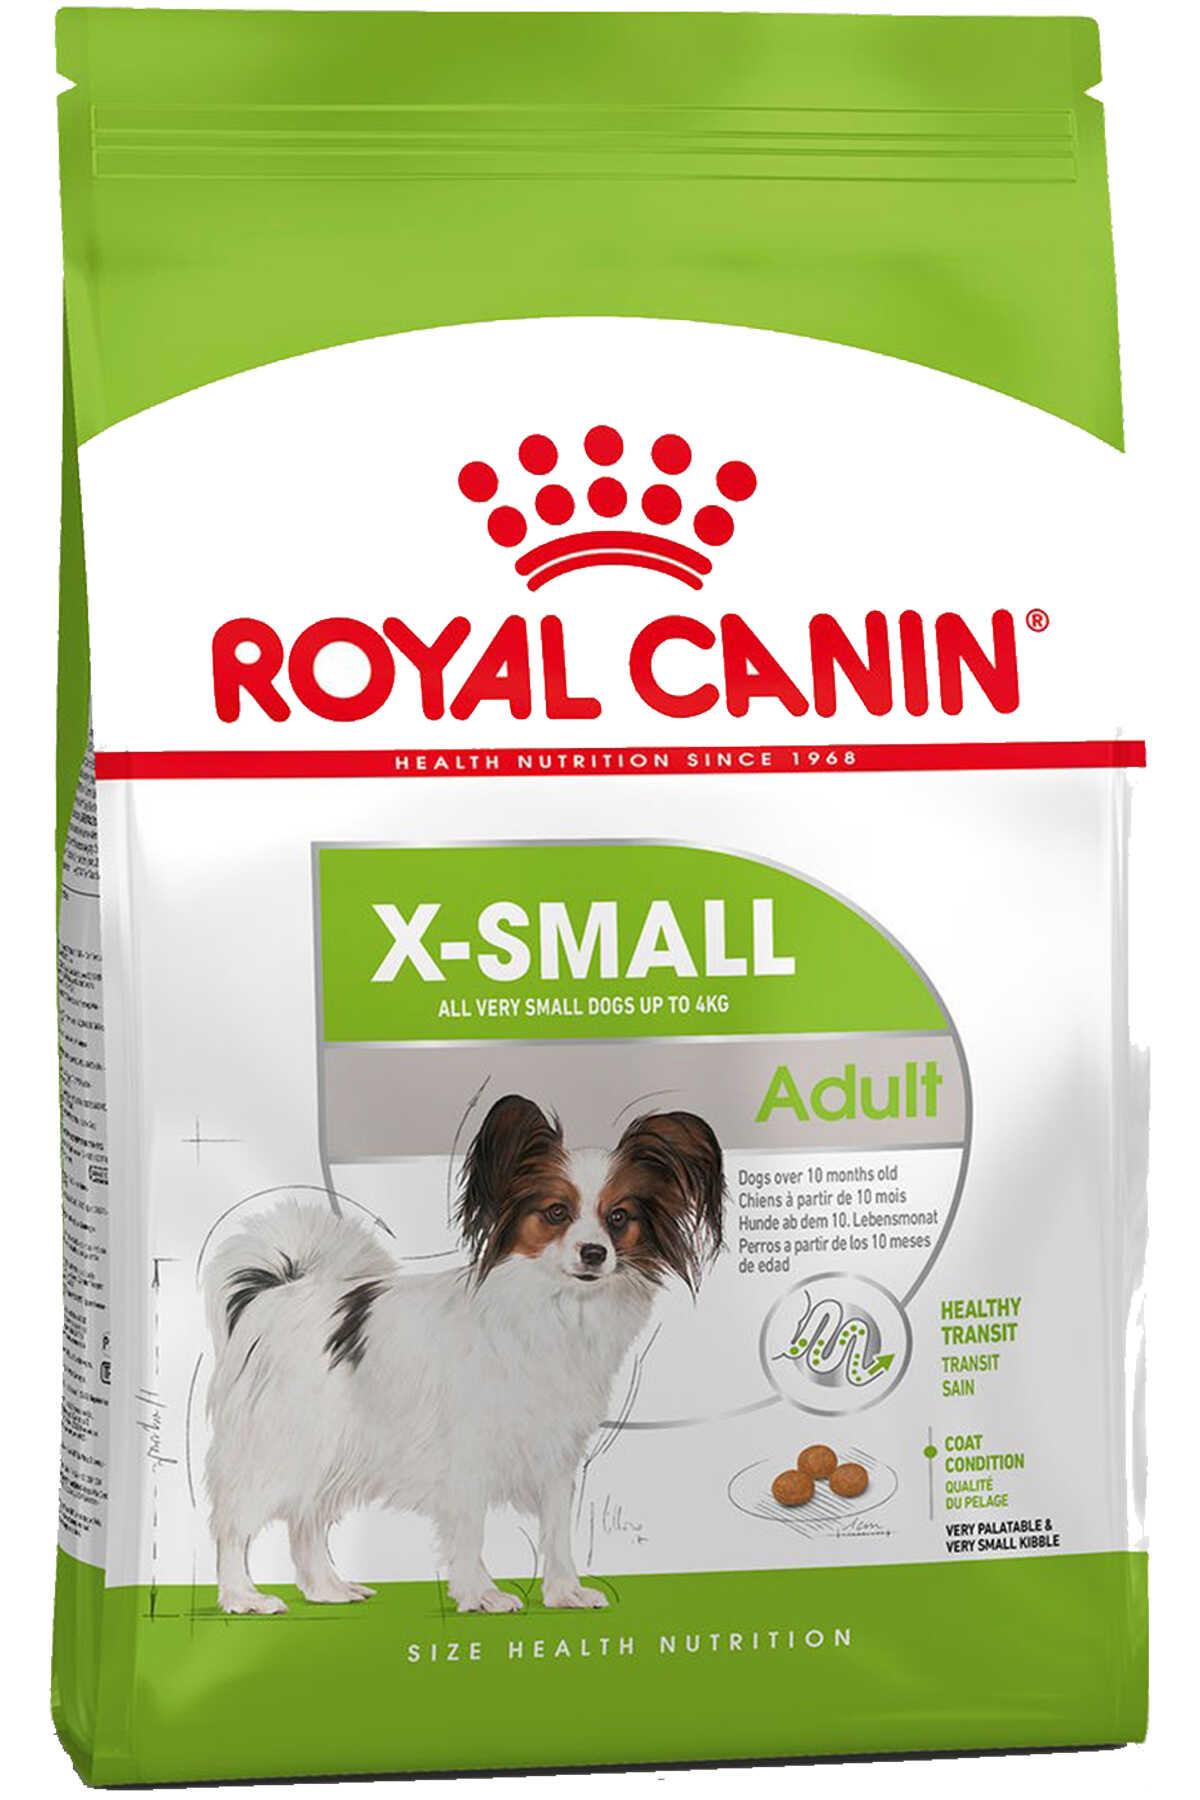 Royal Canin XSmall Küçük Irk Yetişkin Köpek Maması 1,5kg